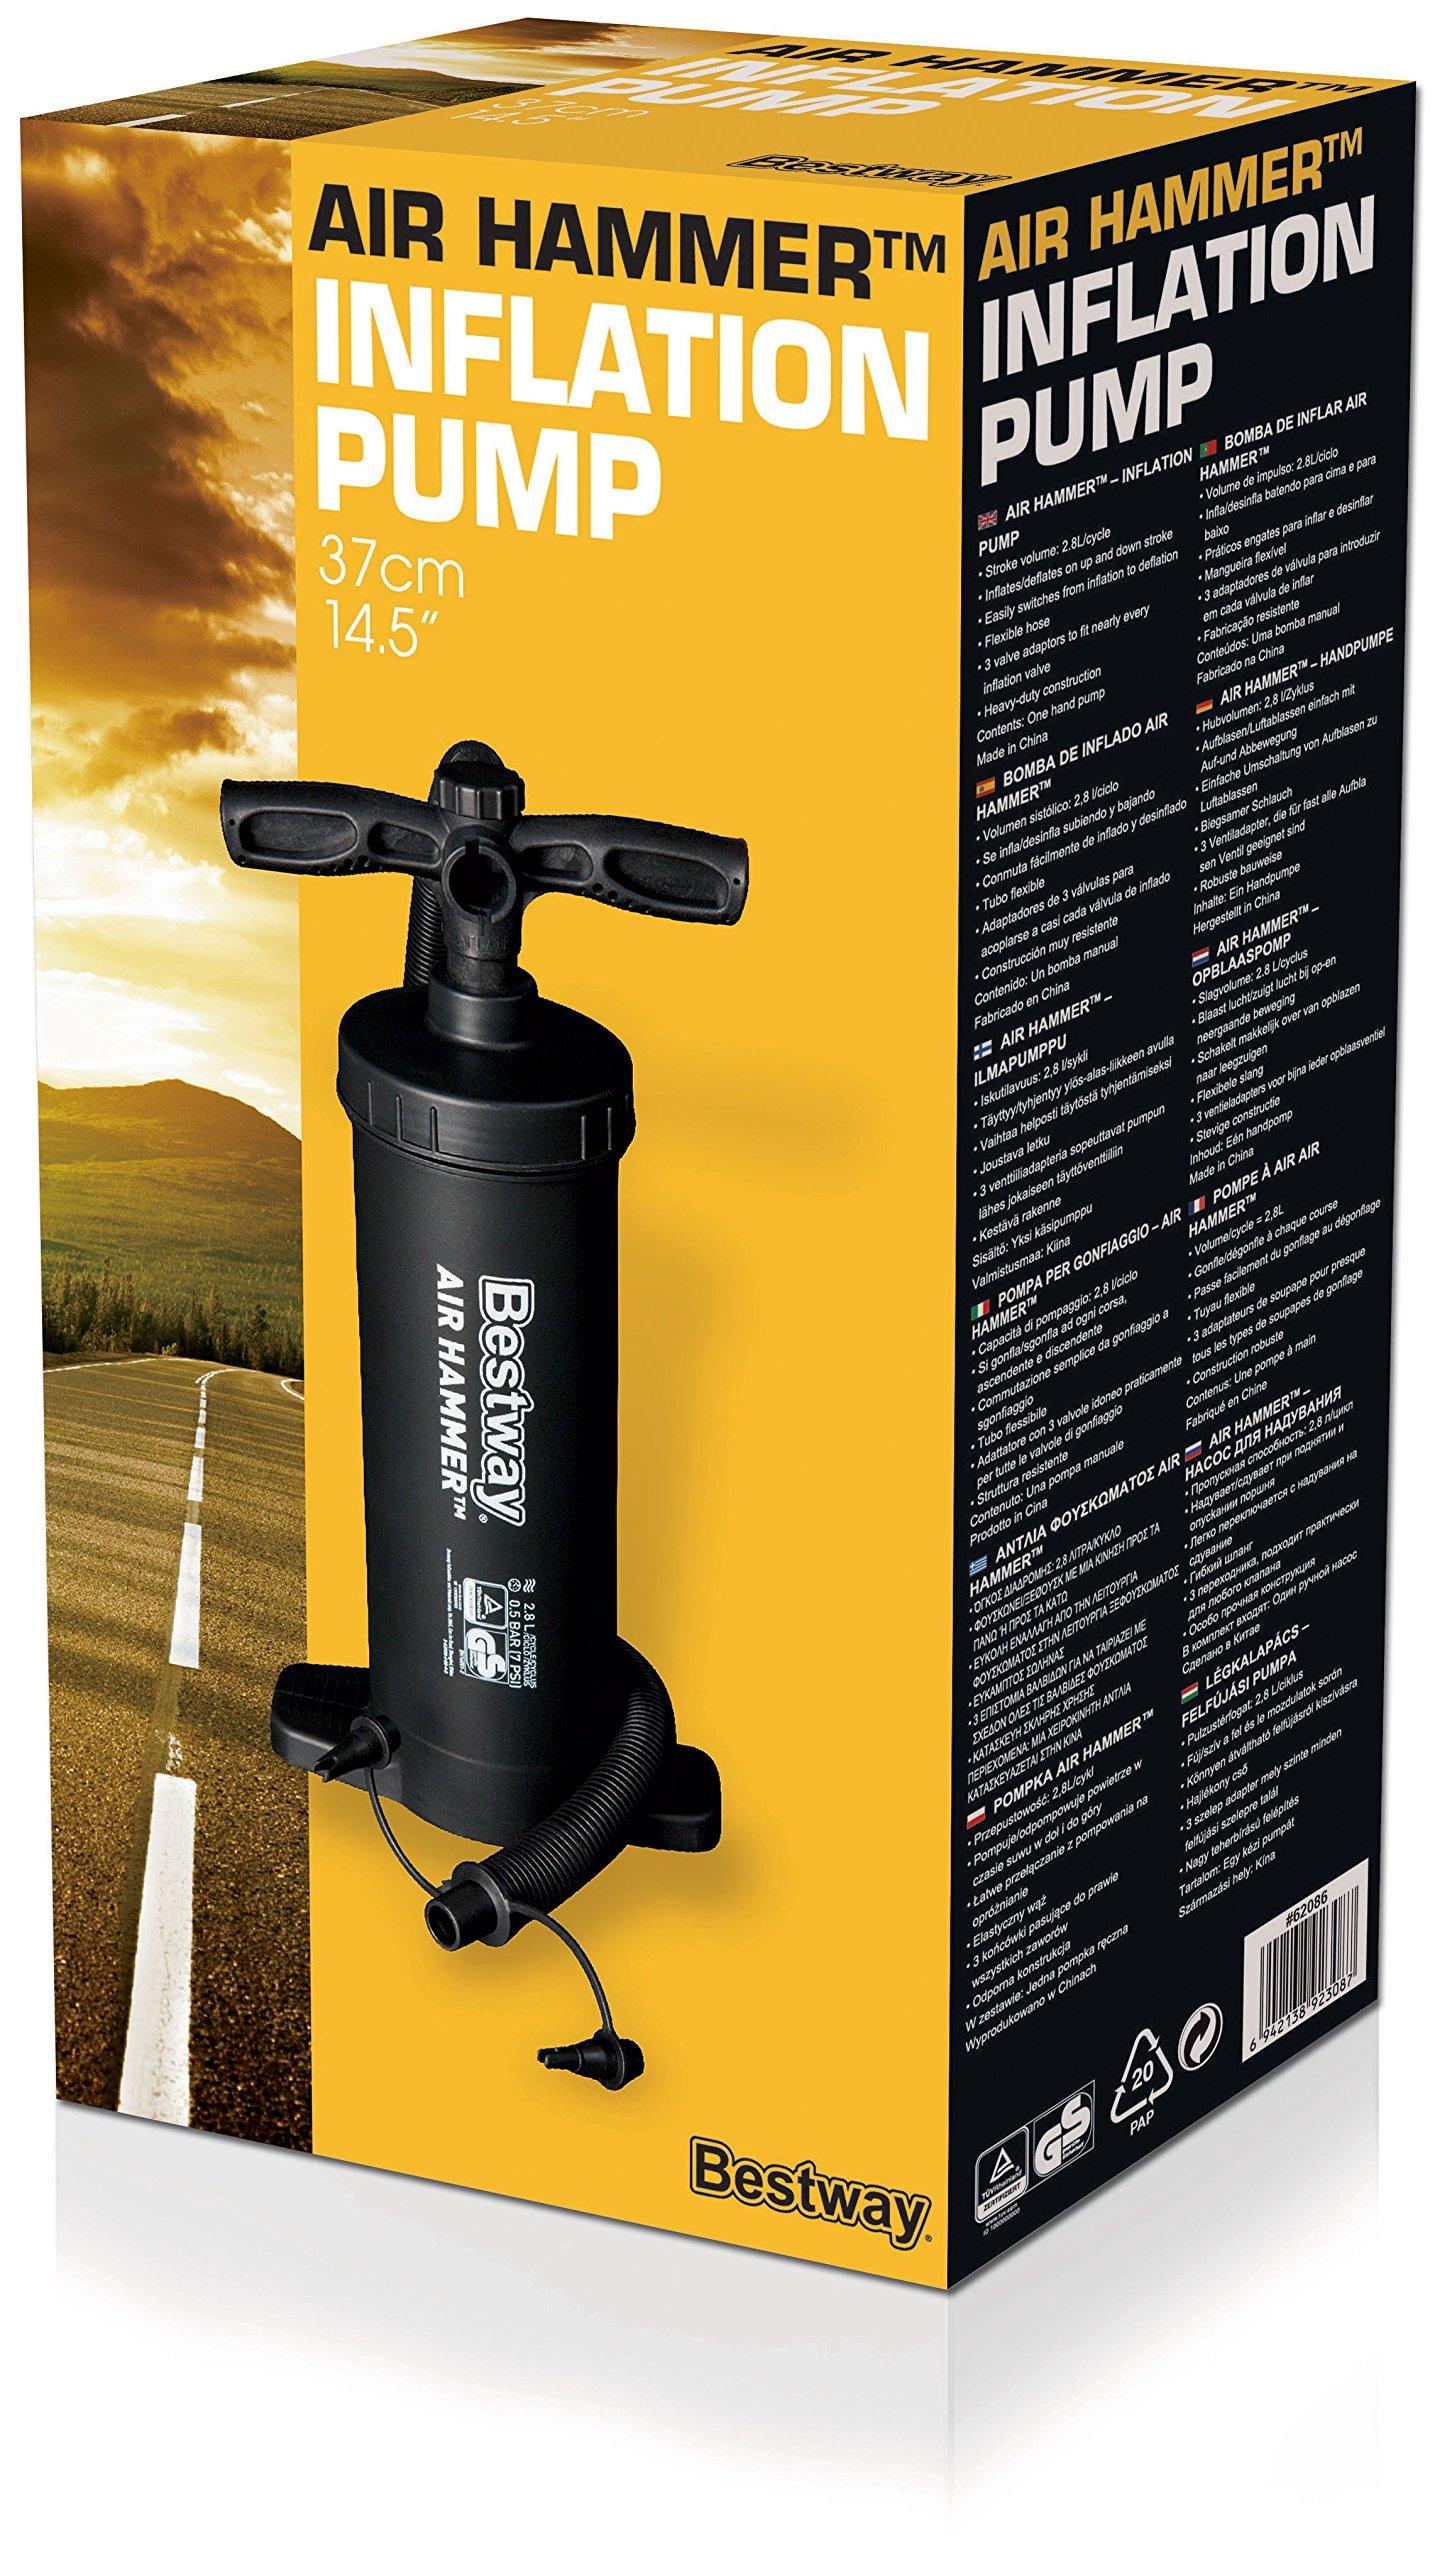 "Bestway 12"" Hammer Inflation Air Pump-Black, 12 Inch 3"